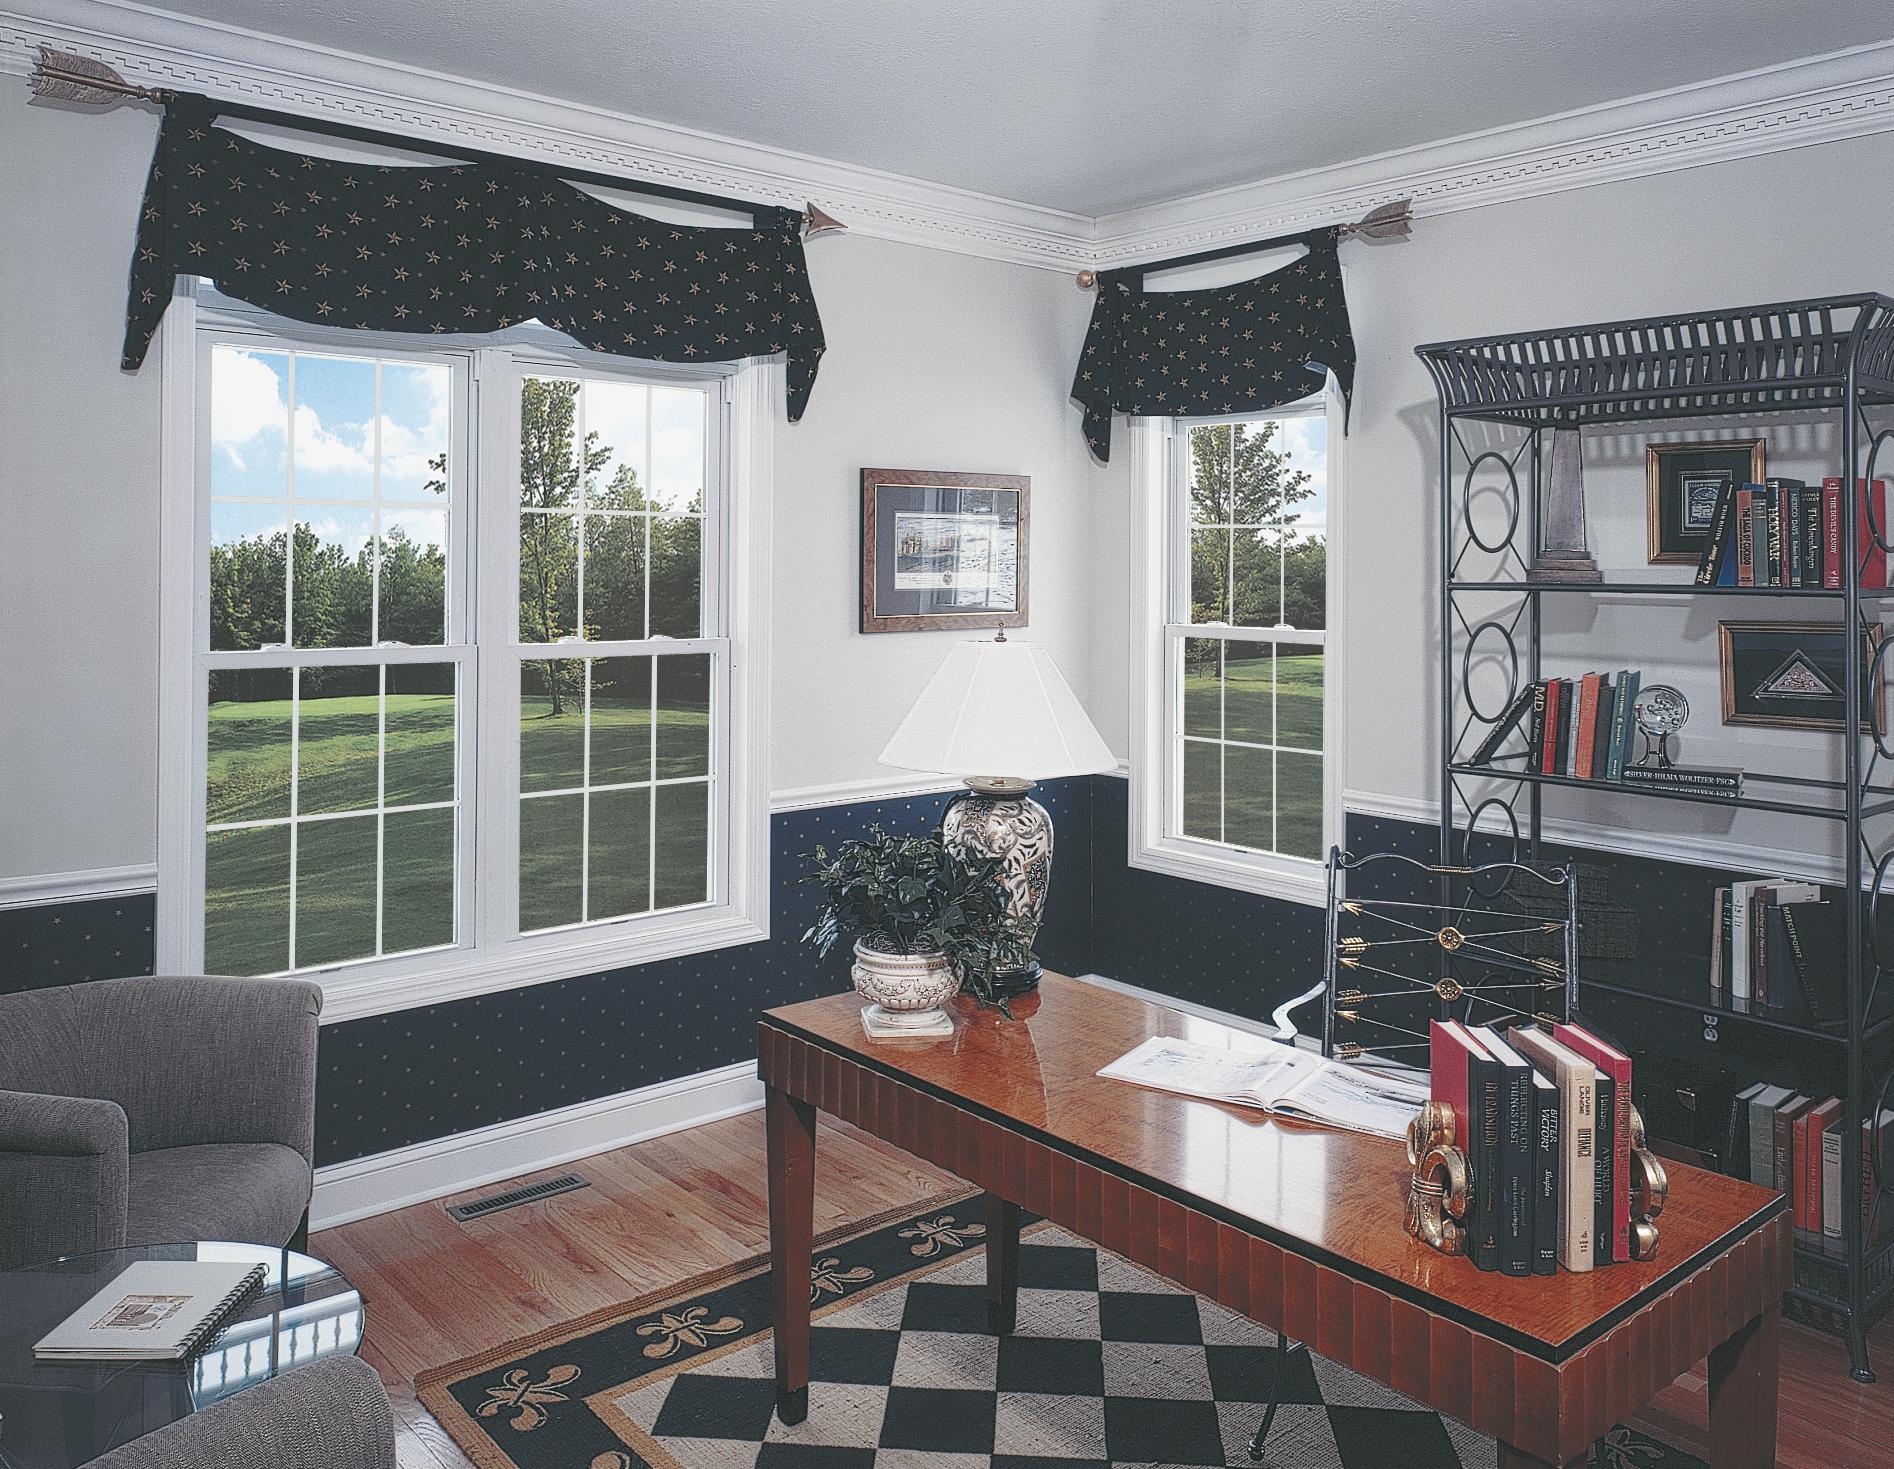 Double Hung Window Security : Window locks for double hung windows homesfeed